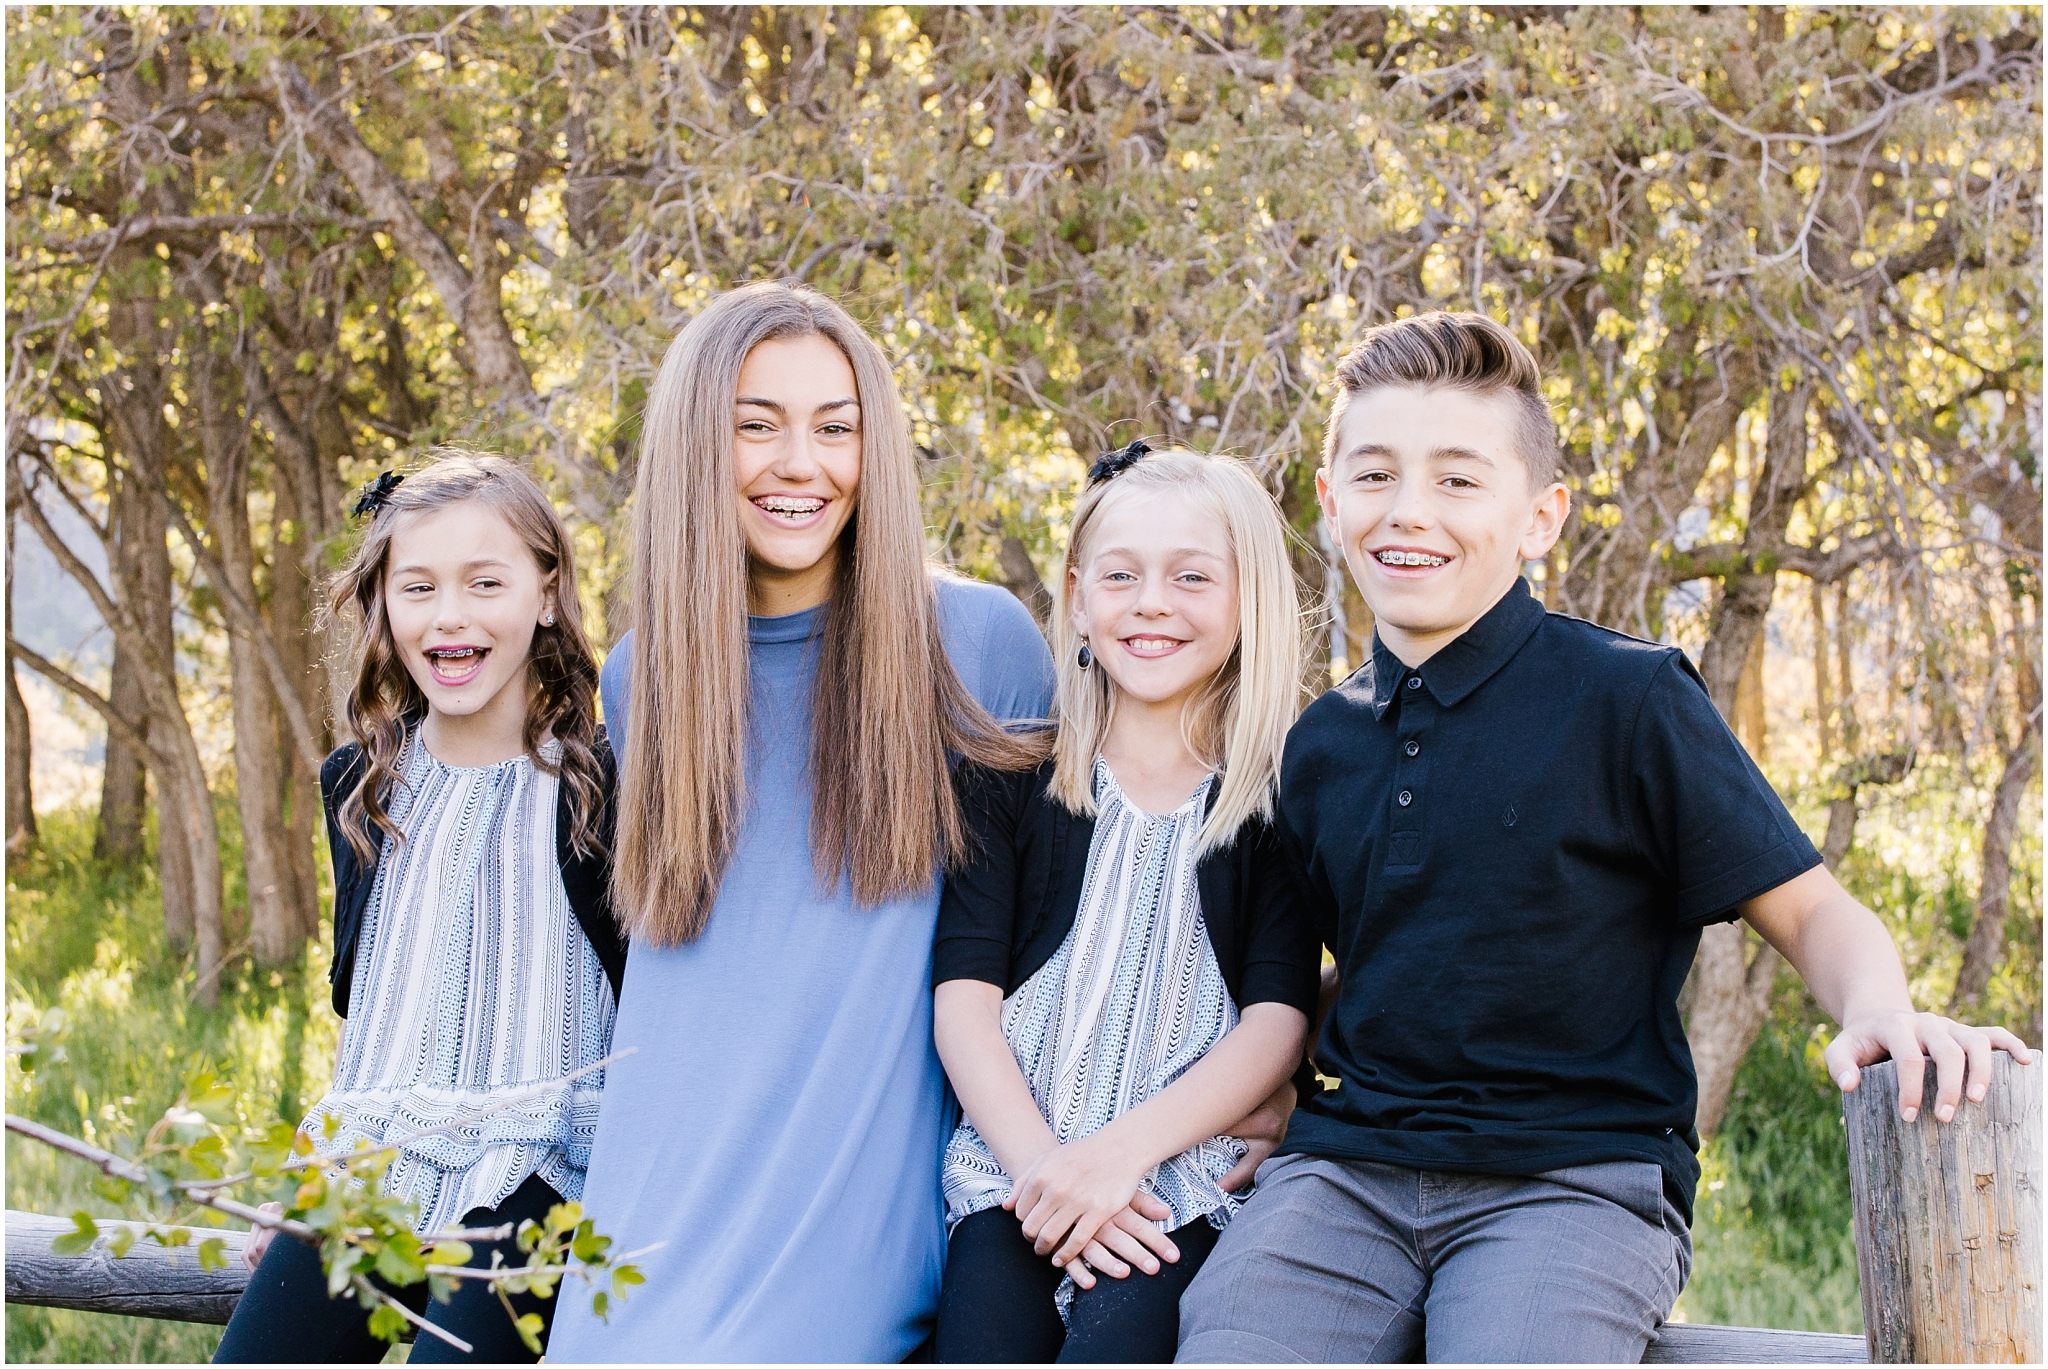 Bagley-47_Lizzie-B-Imagery-Utah-Family-Photographer-Central-Utah-Photographer-Utah-County-Extended-Family.jpg